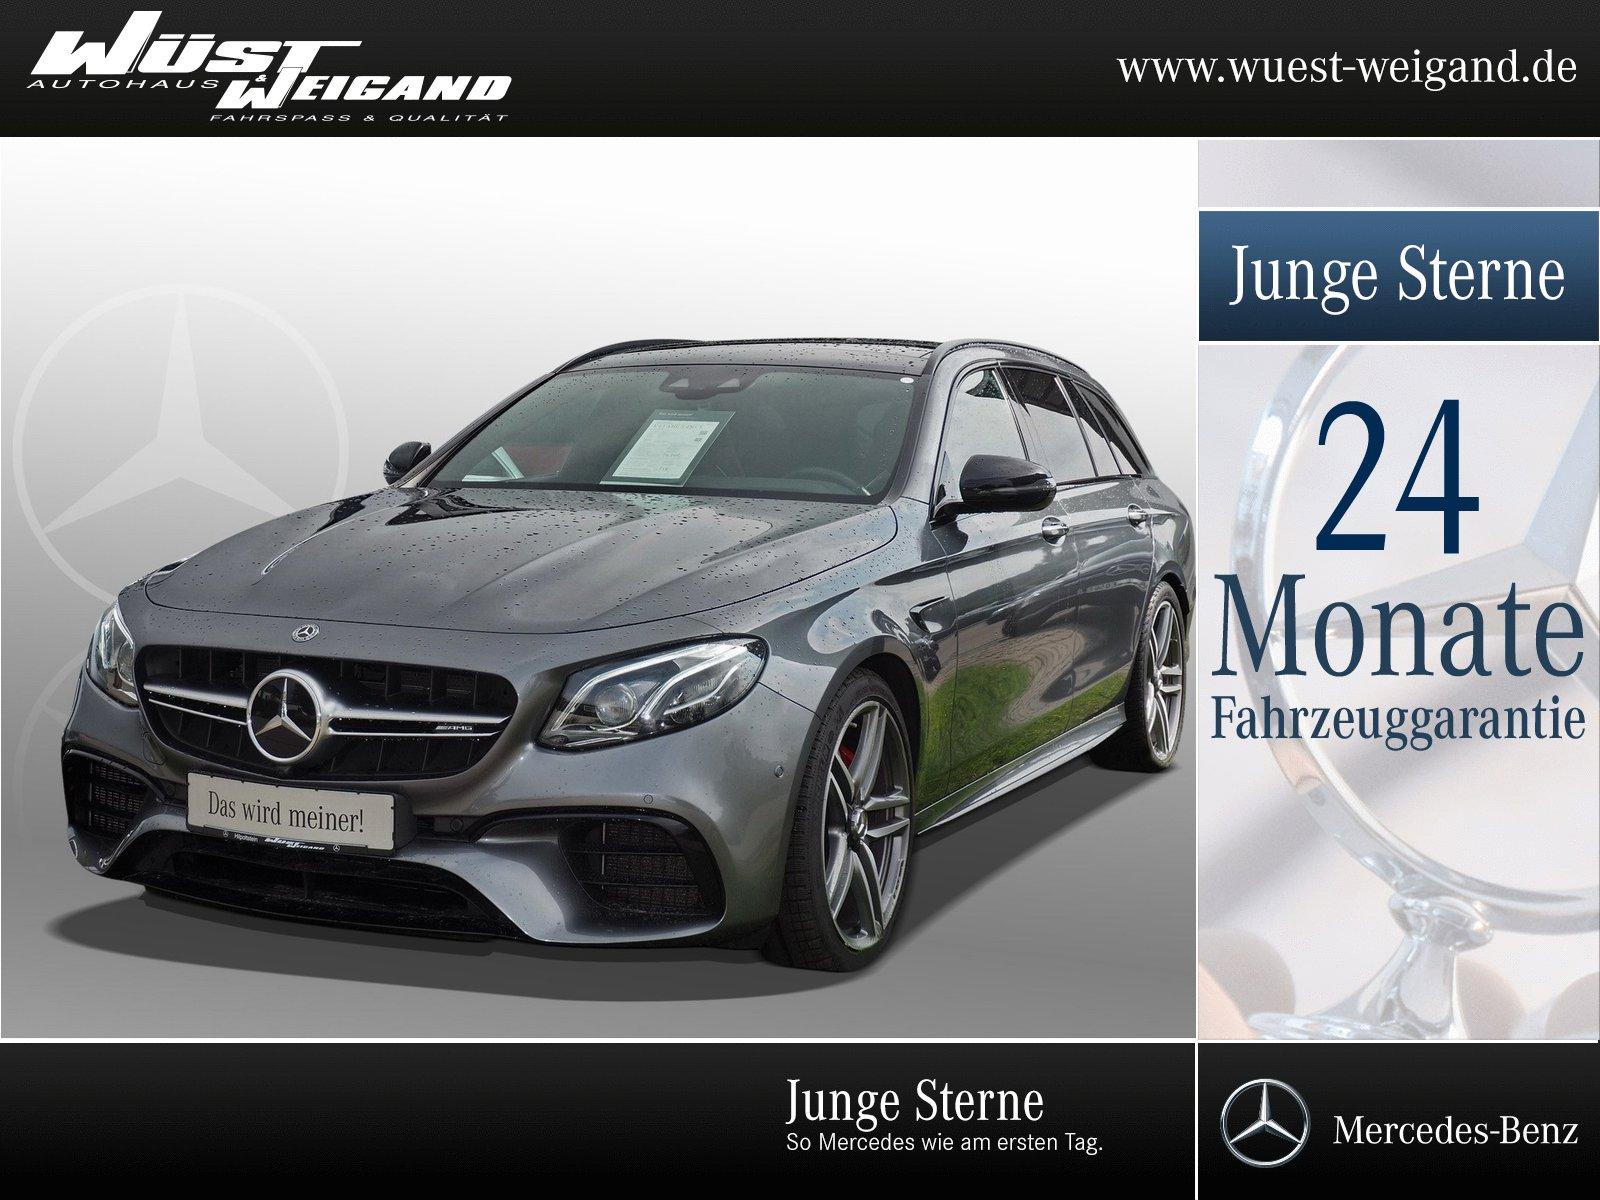 Mercedes-Benz E 63 AMG S 4M T Pano.Dach+Standh.+Perf.-Sitze, Jahr 2017, Benzin